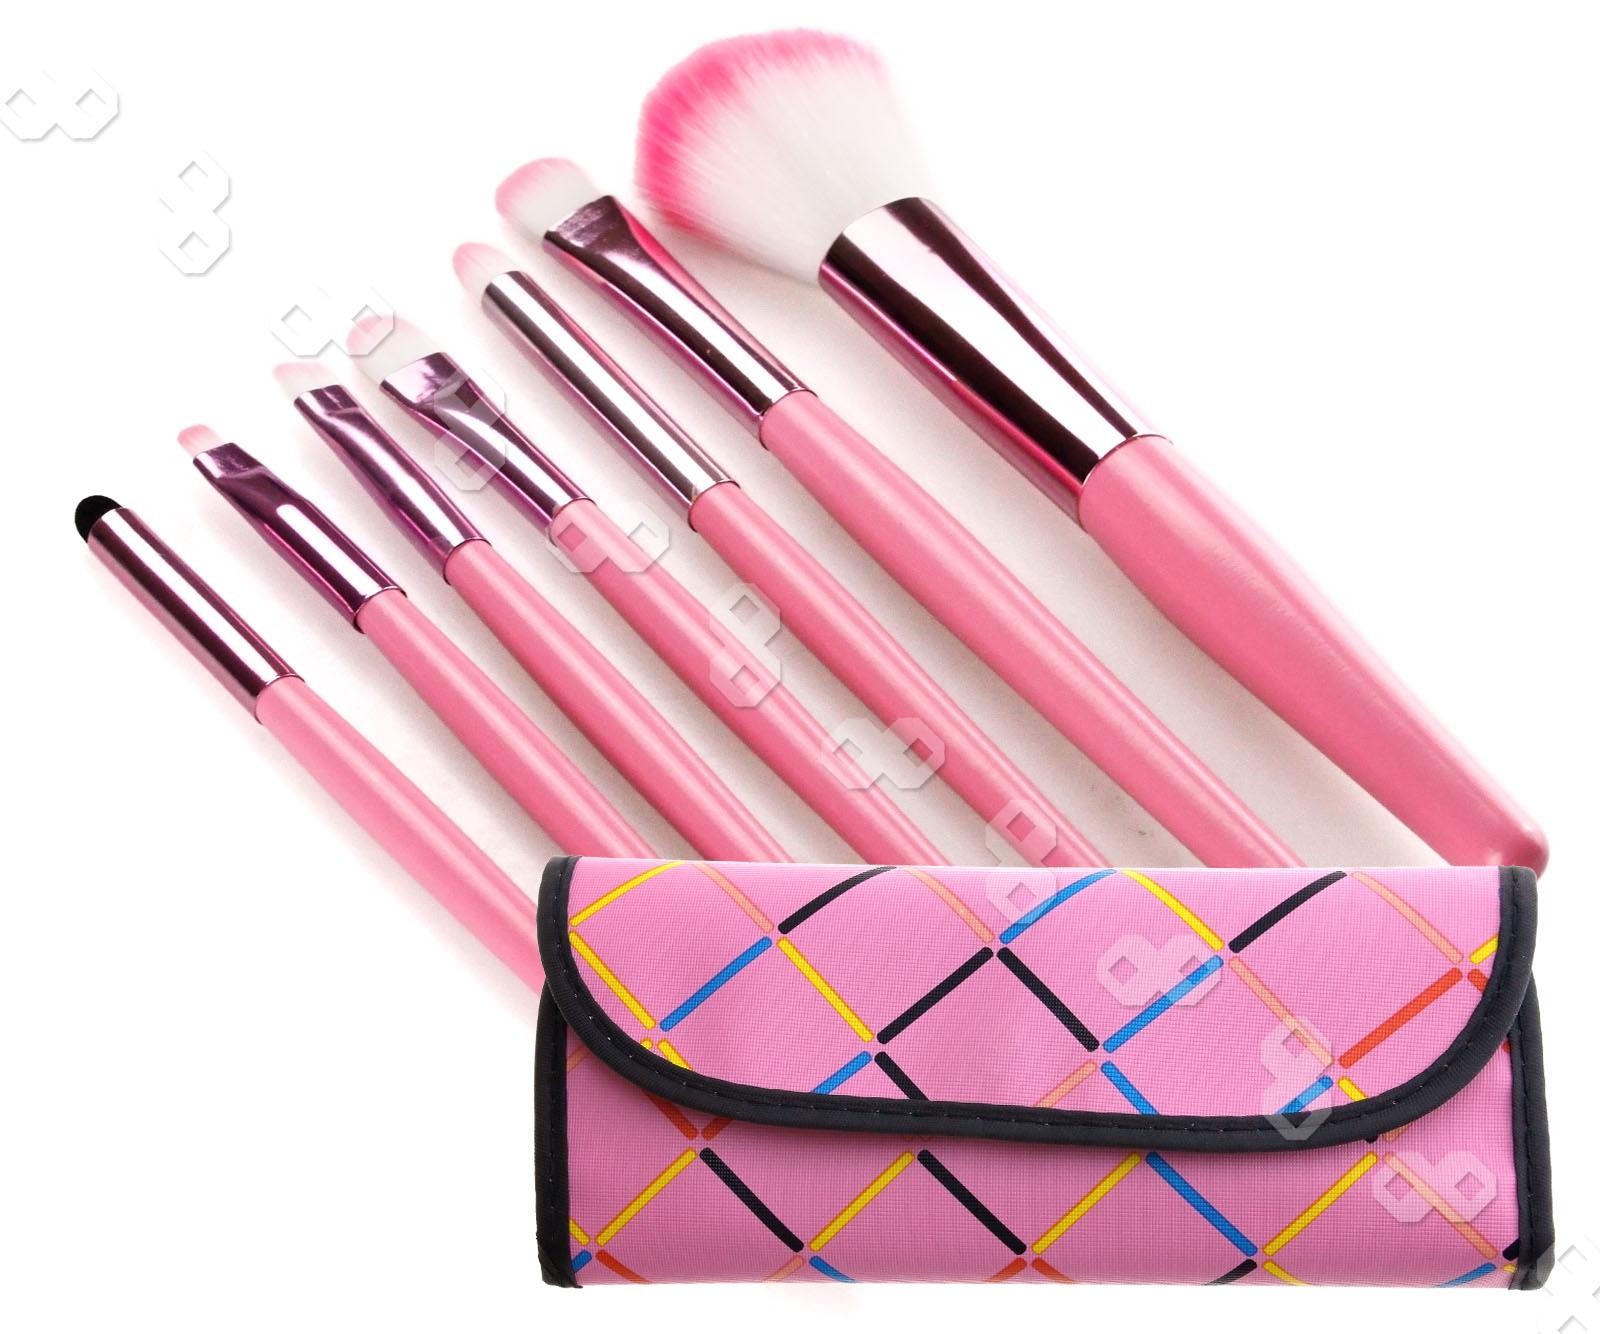 7Pcs Professional Pink Make up Brush Makeup Kit